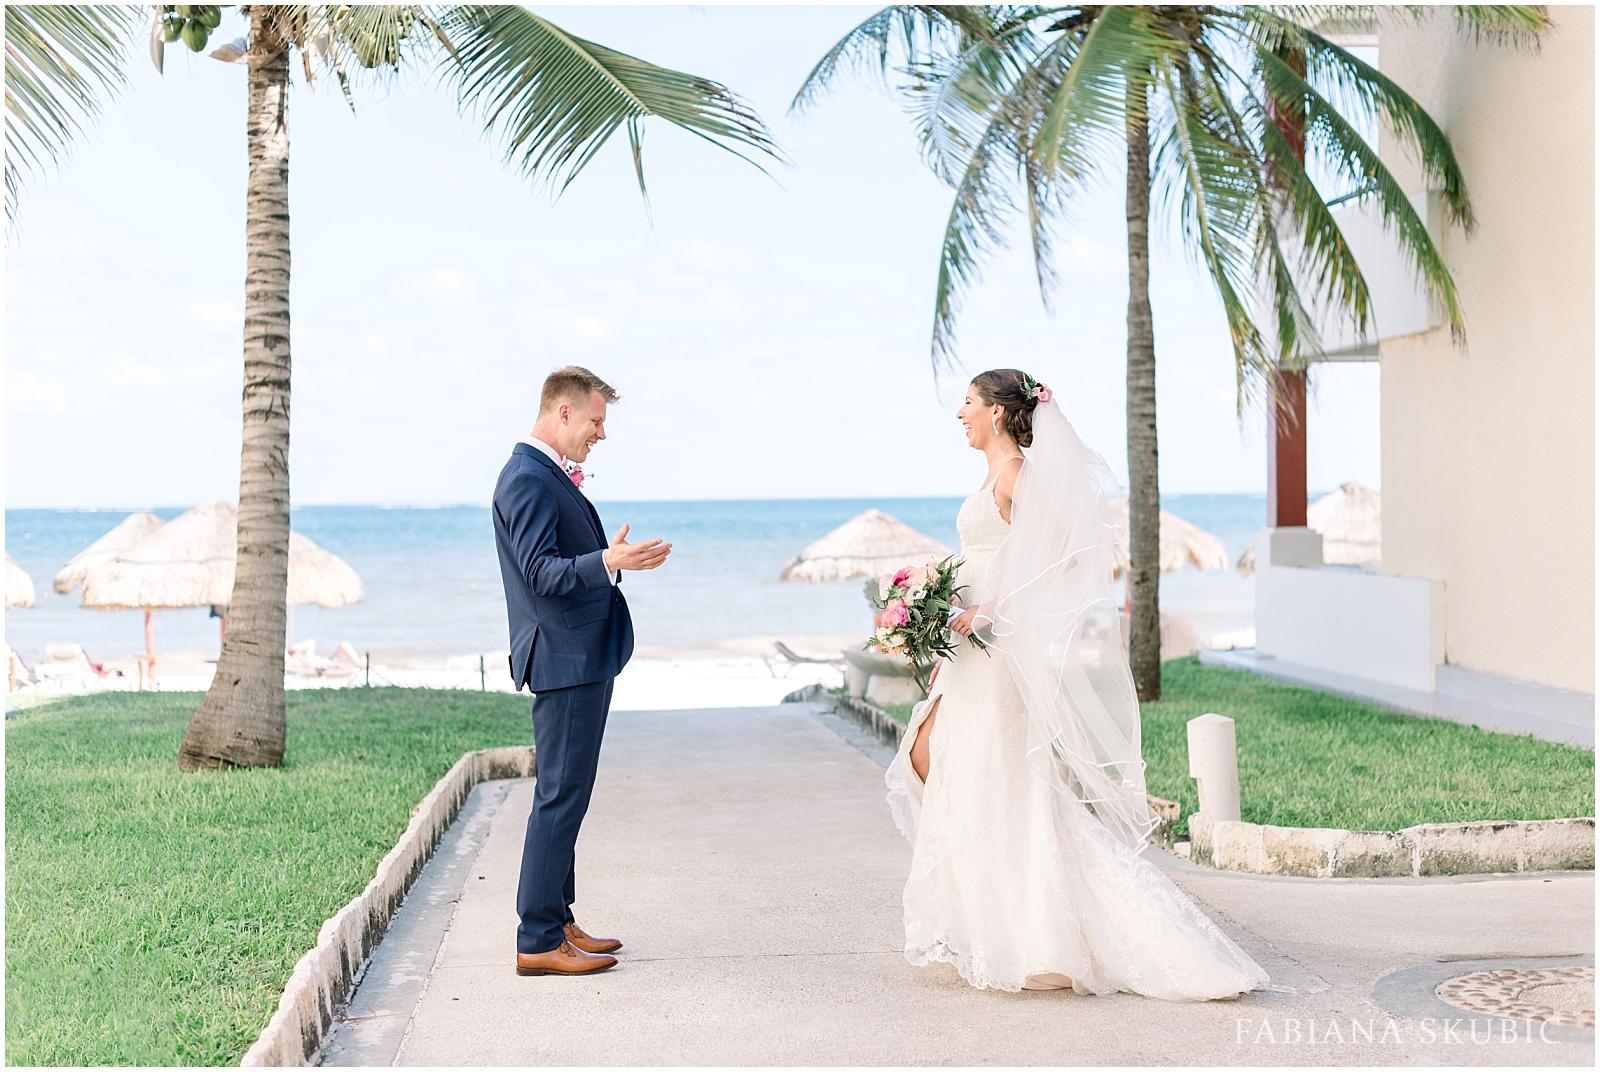 TJ_Now_Sapphire_Riviera_Cancun_Mexico_Wedding_Photos_0191.jpg